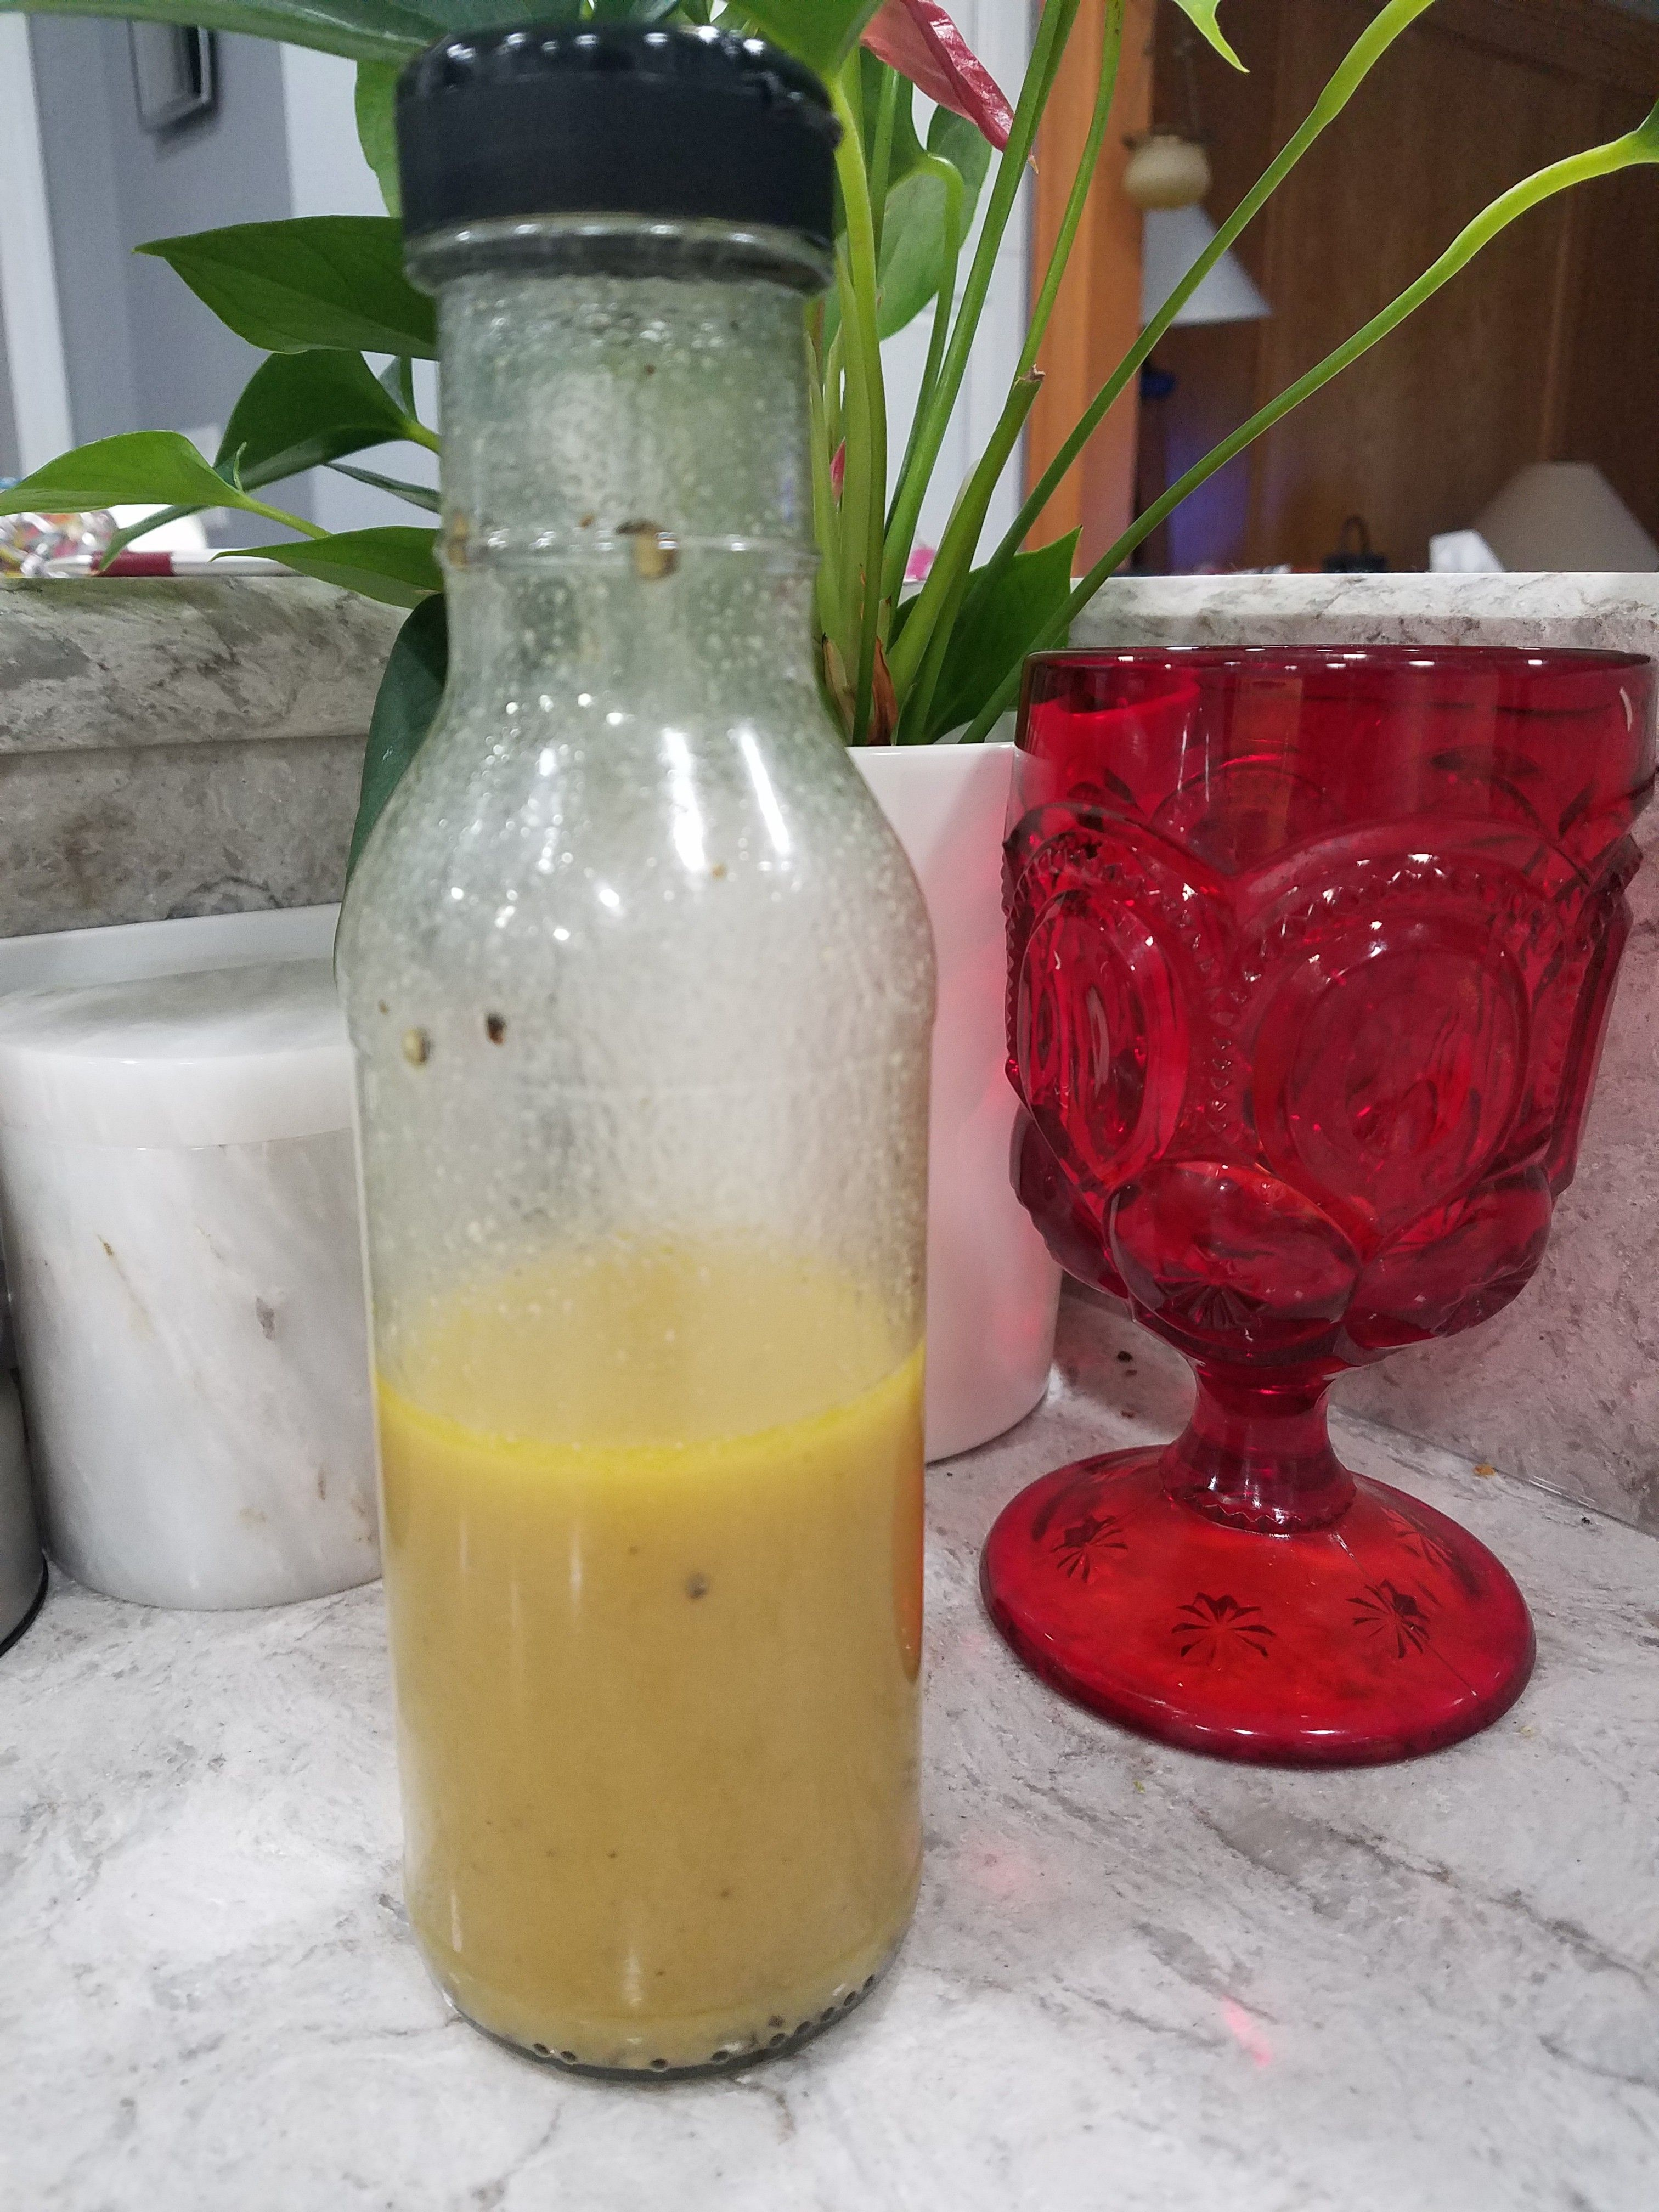 Simple White Balsamic Vinaigrette Recipe White Balsamic Vinaigrette Balsamic Vinaigrette Balsamic Vinaigrette Dressing